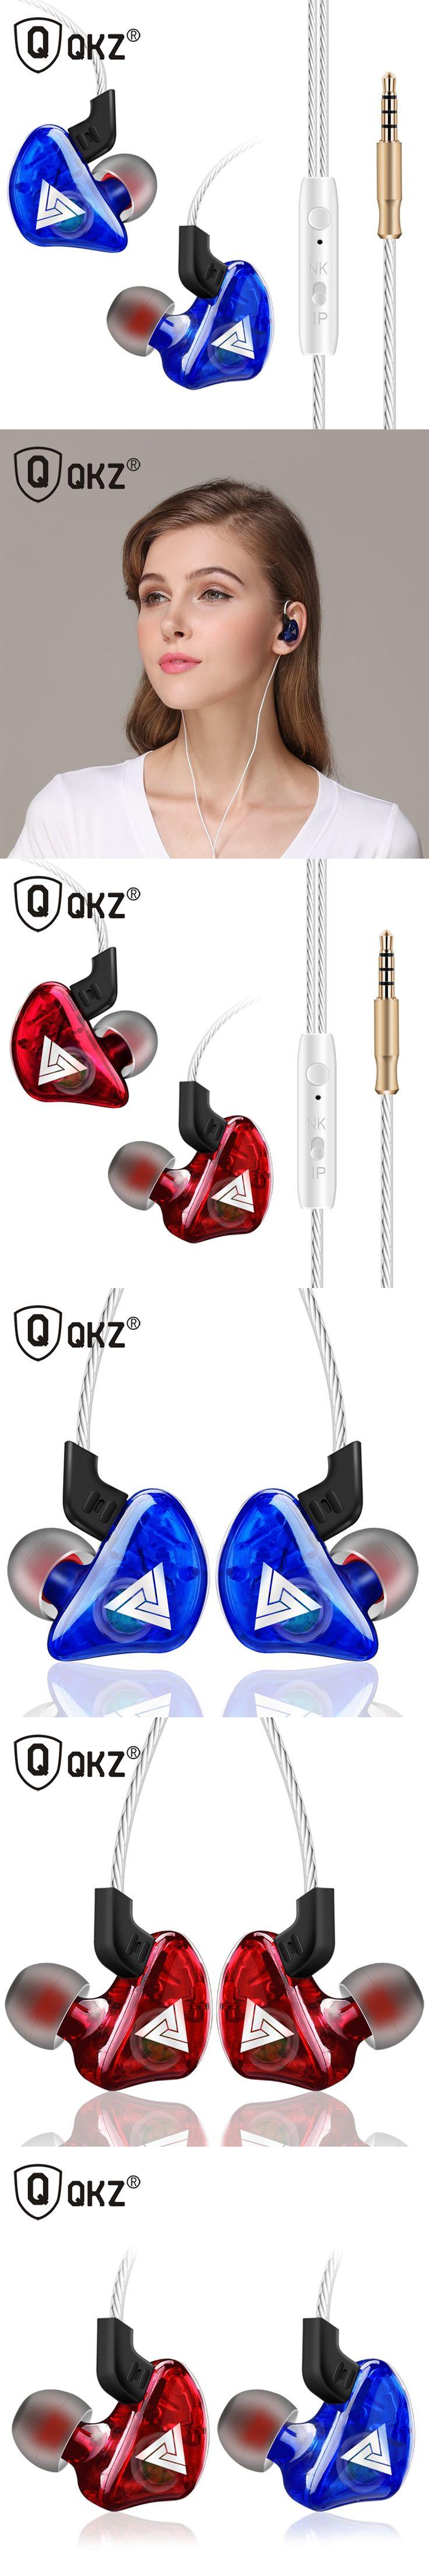 2016 New KZ ED12 In Ear Earphone Stereo Running Sport Earphone Noise Cancelling HIFI Bass Monito Earphone Headset Free Shipping